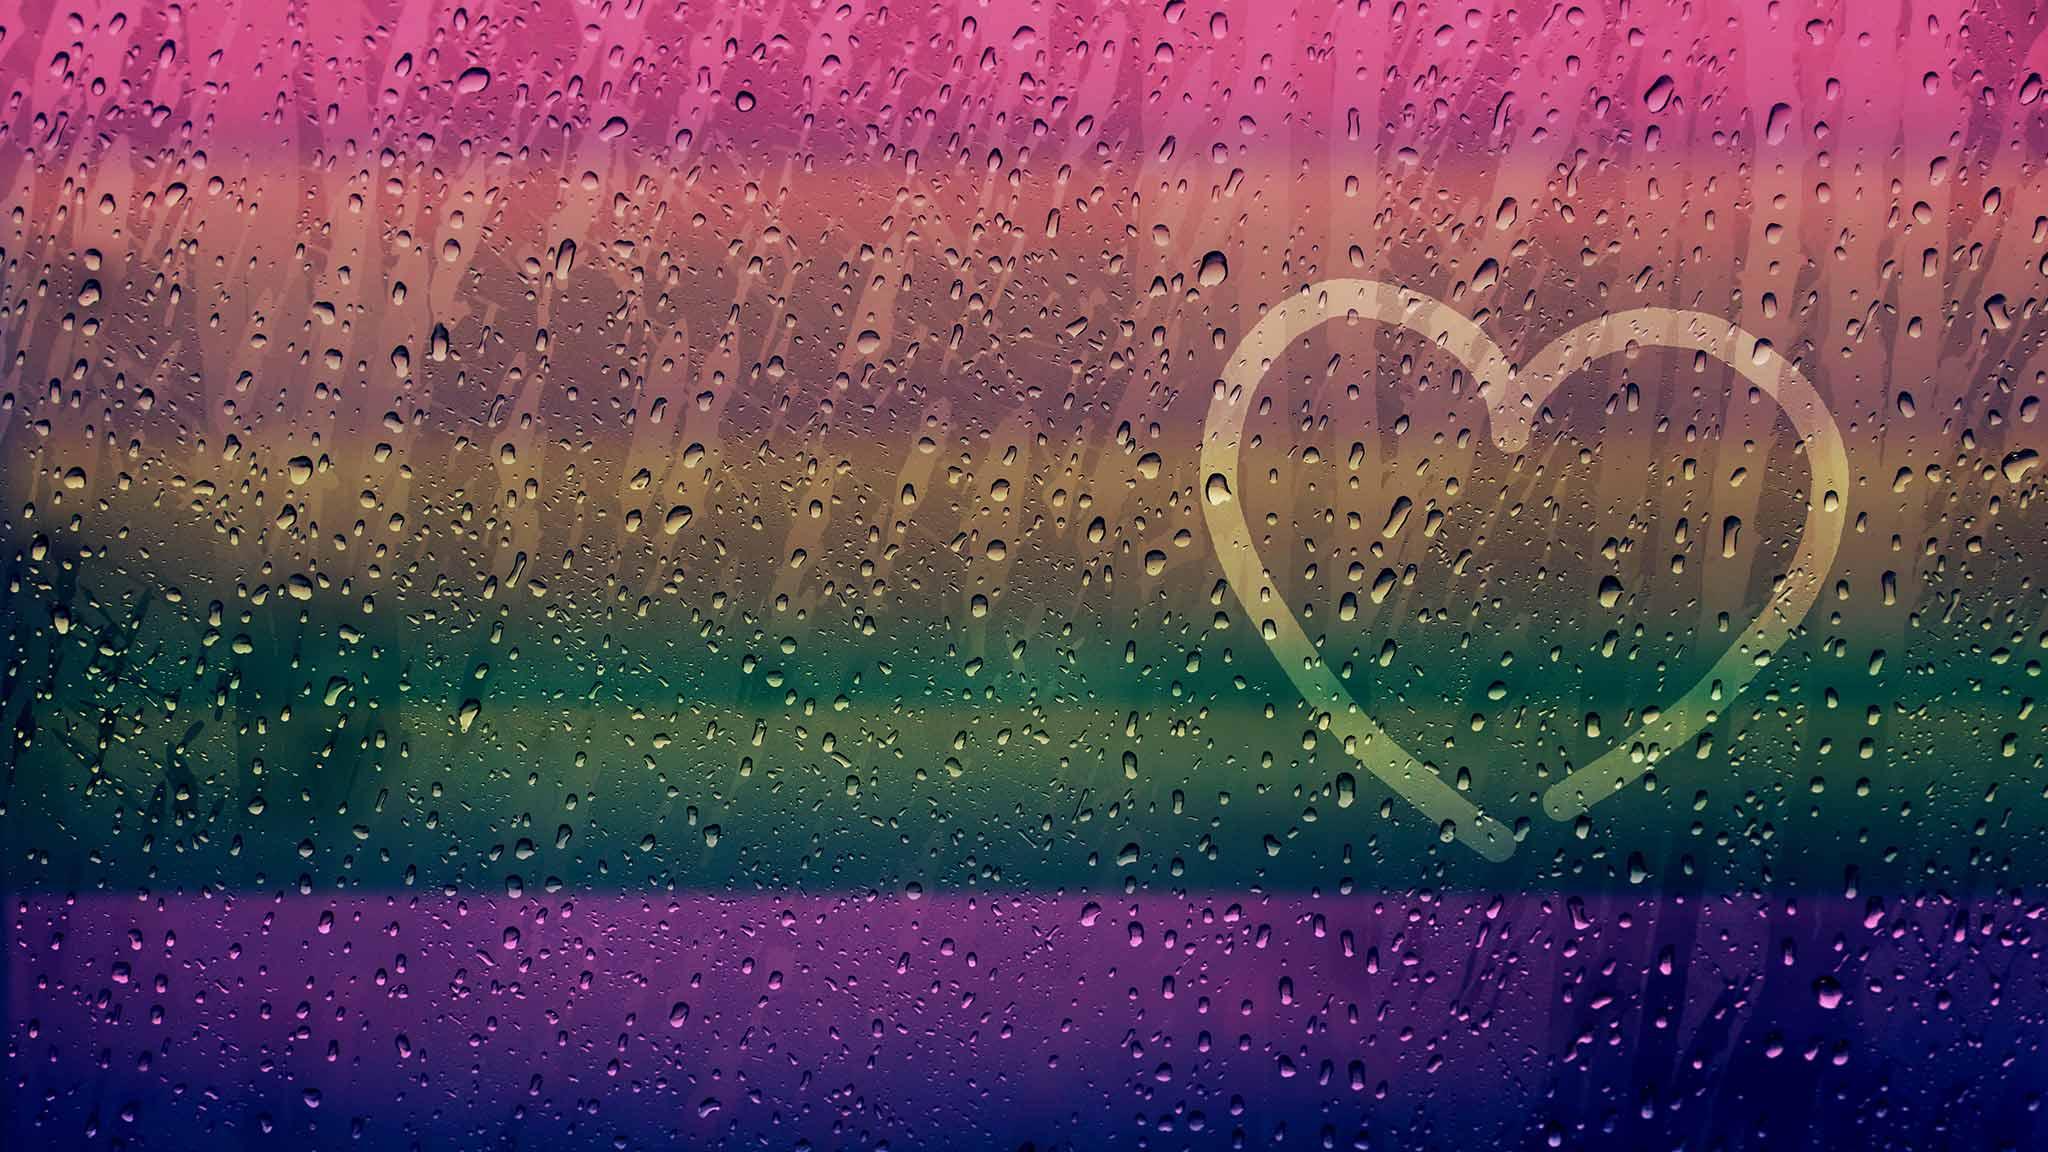 Finger-Drawn Heart Shape On Rainy Window Surface With A Rainbow Cast